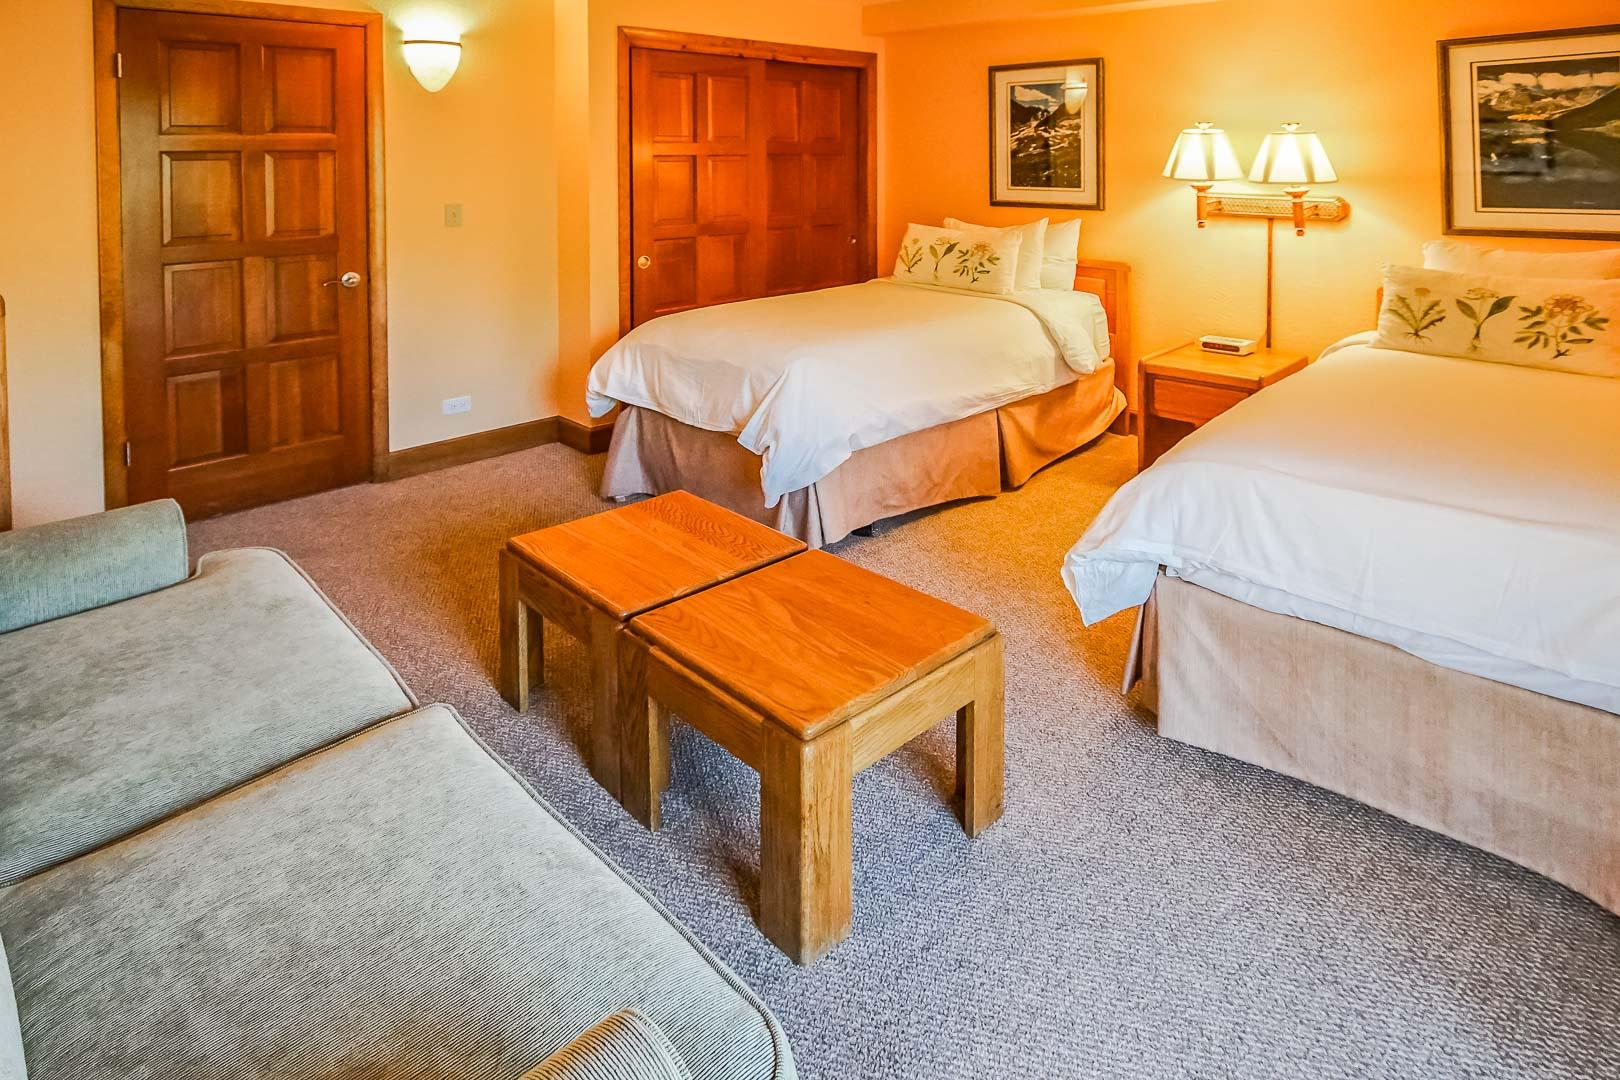 A spacious bedroom with double beds at VRI's Cedar at Streamside in Colorado.